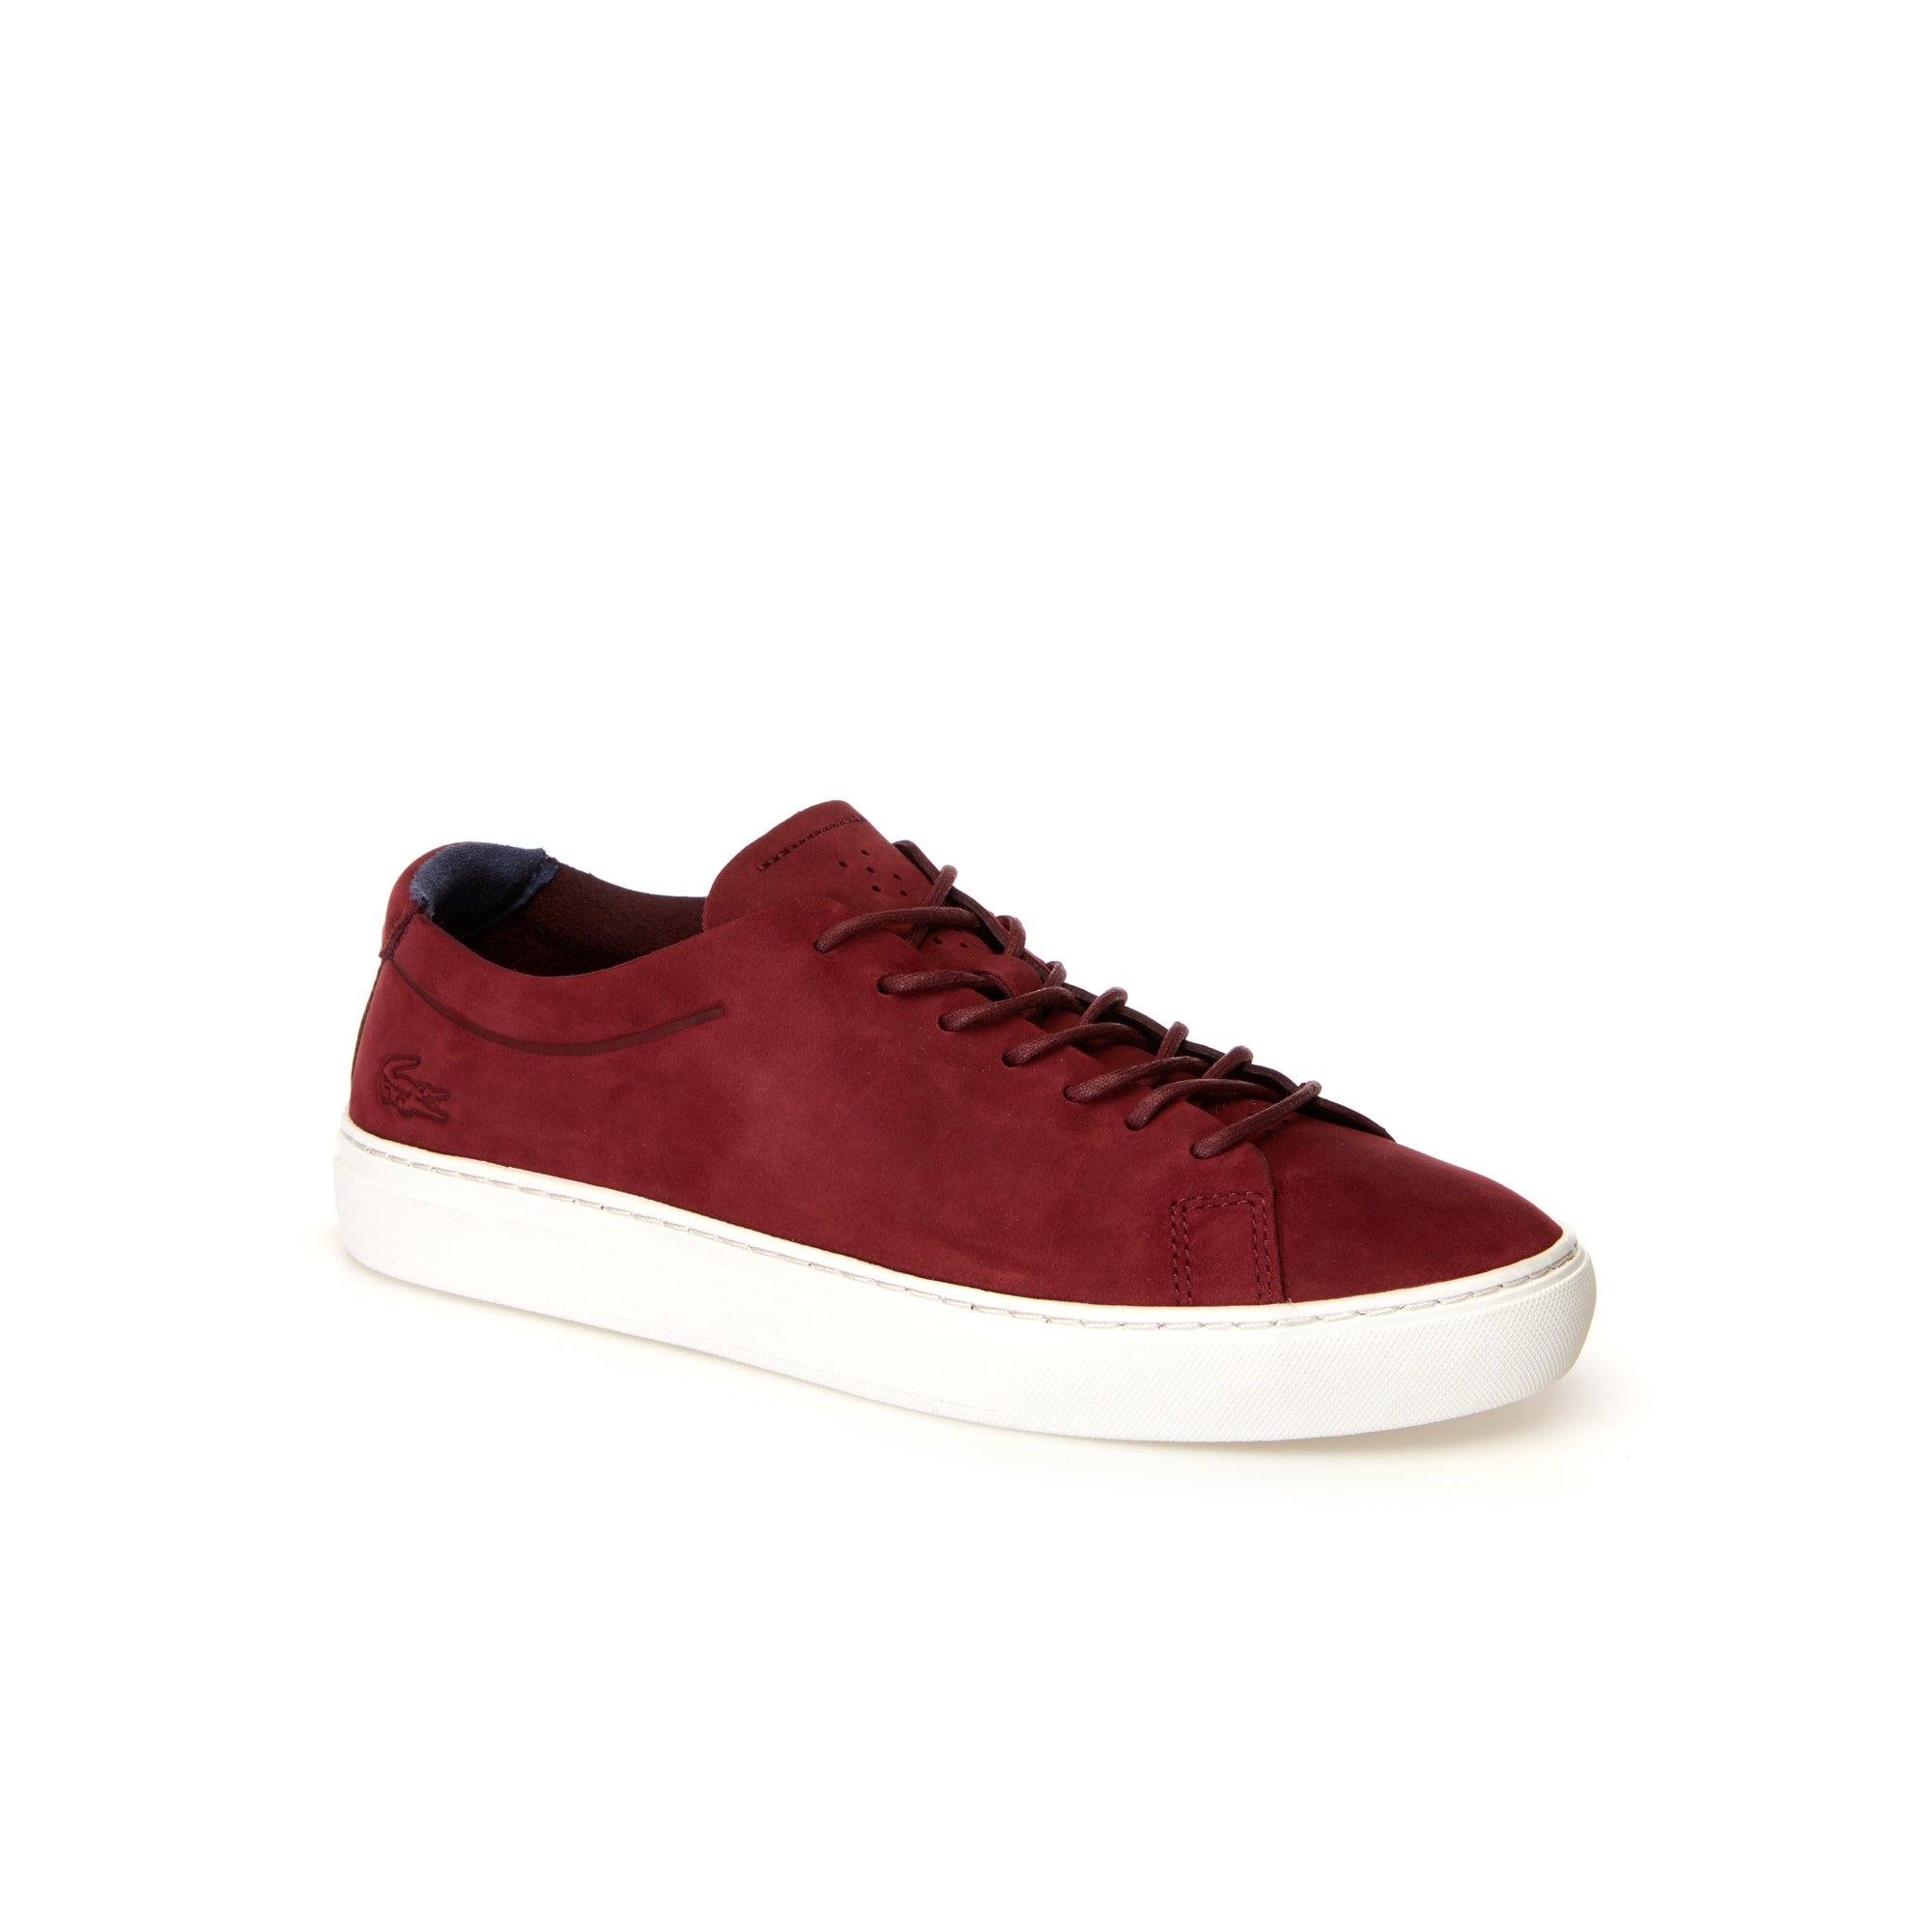 Herren-Sneakers L.12.12 UNLINED aus Nubukleder